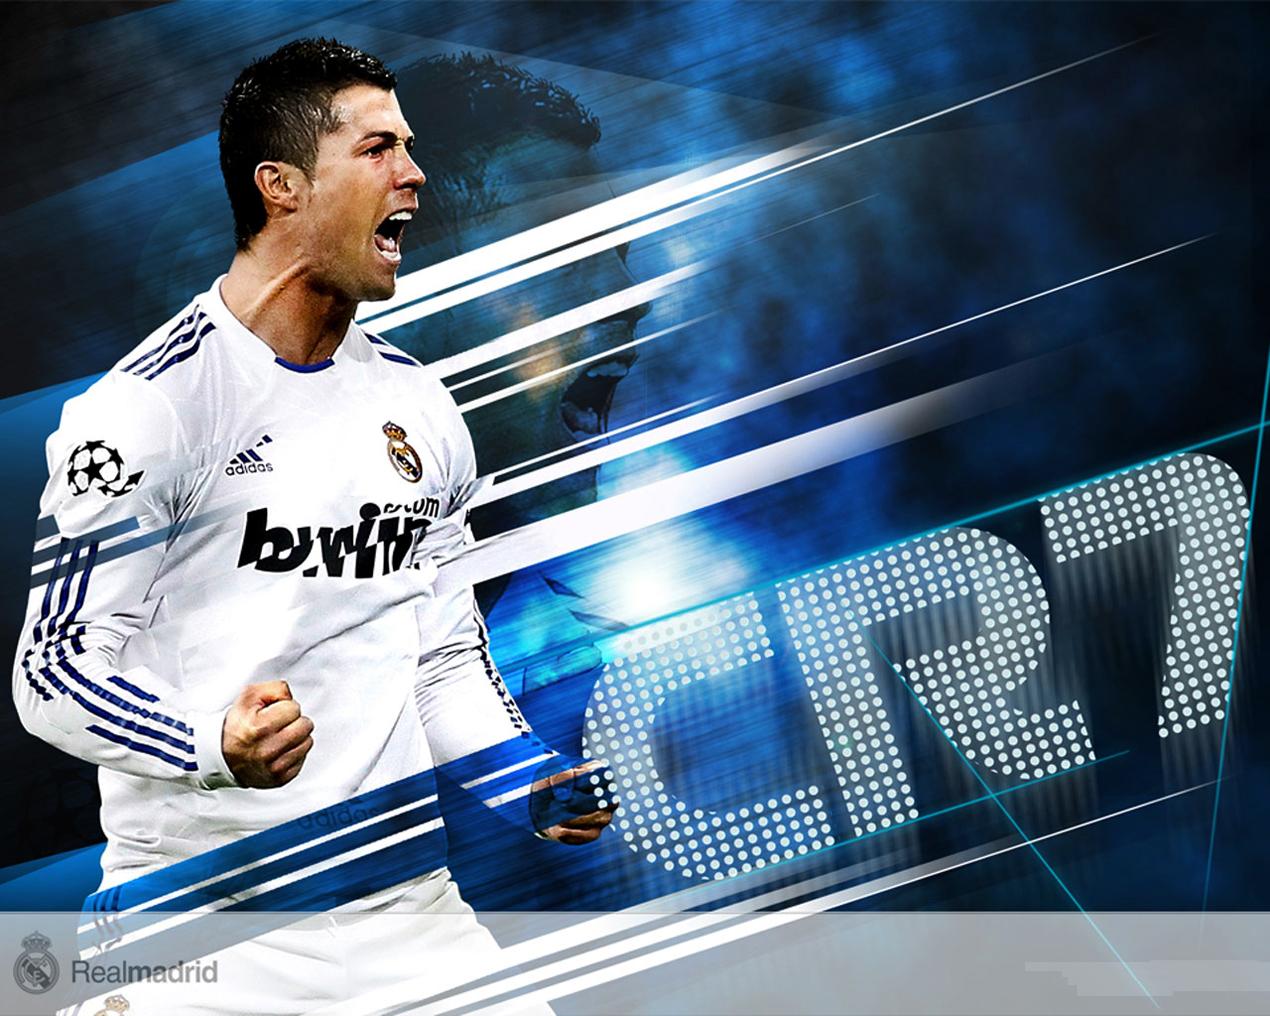 Cristiano Ronaldo Cool Wallpaper at Best HD Wallpaper